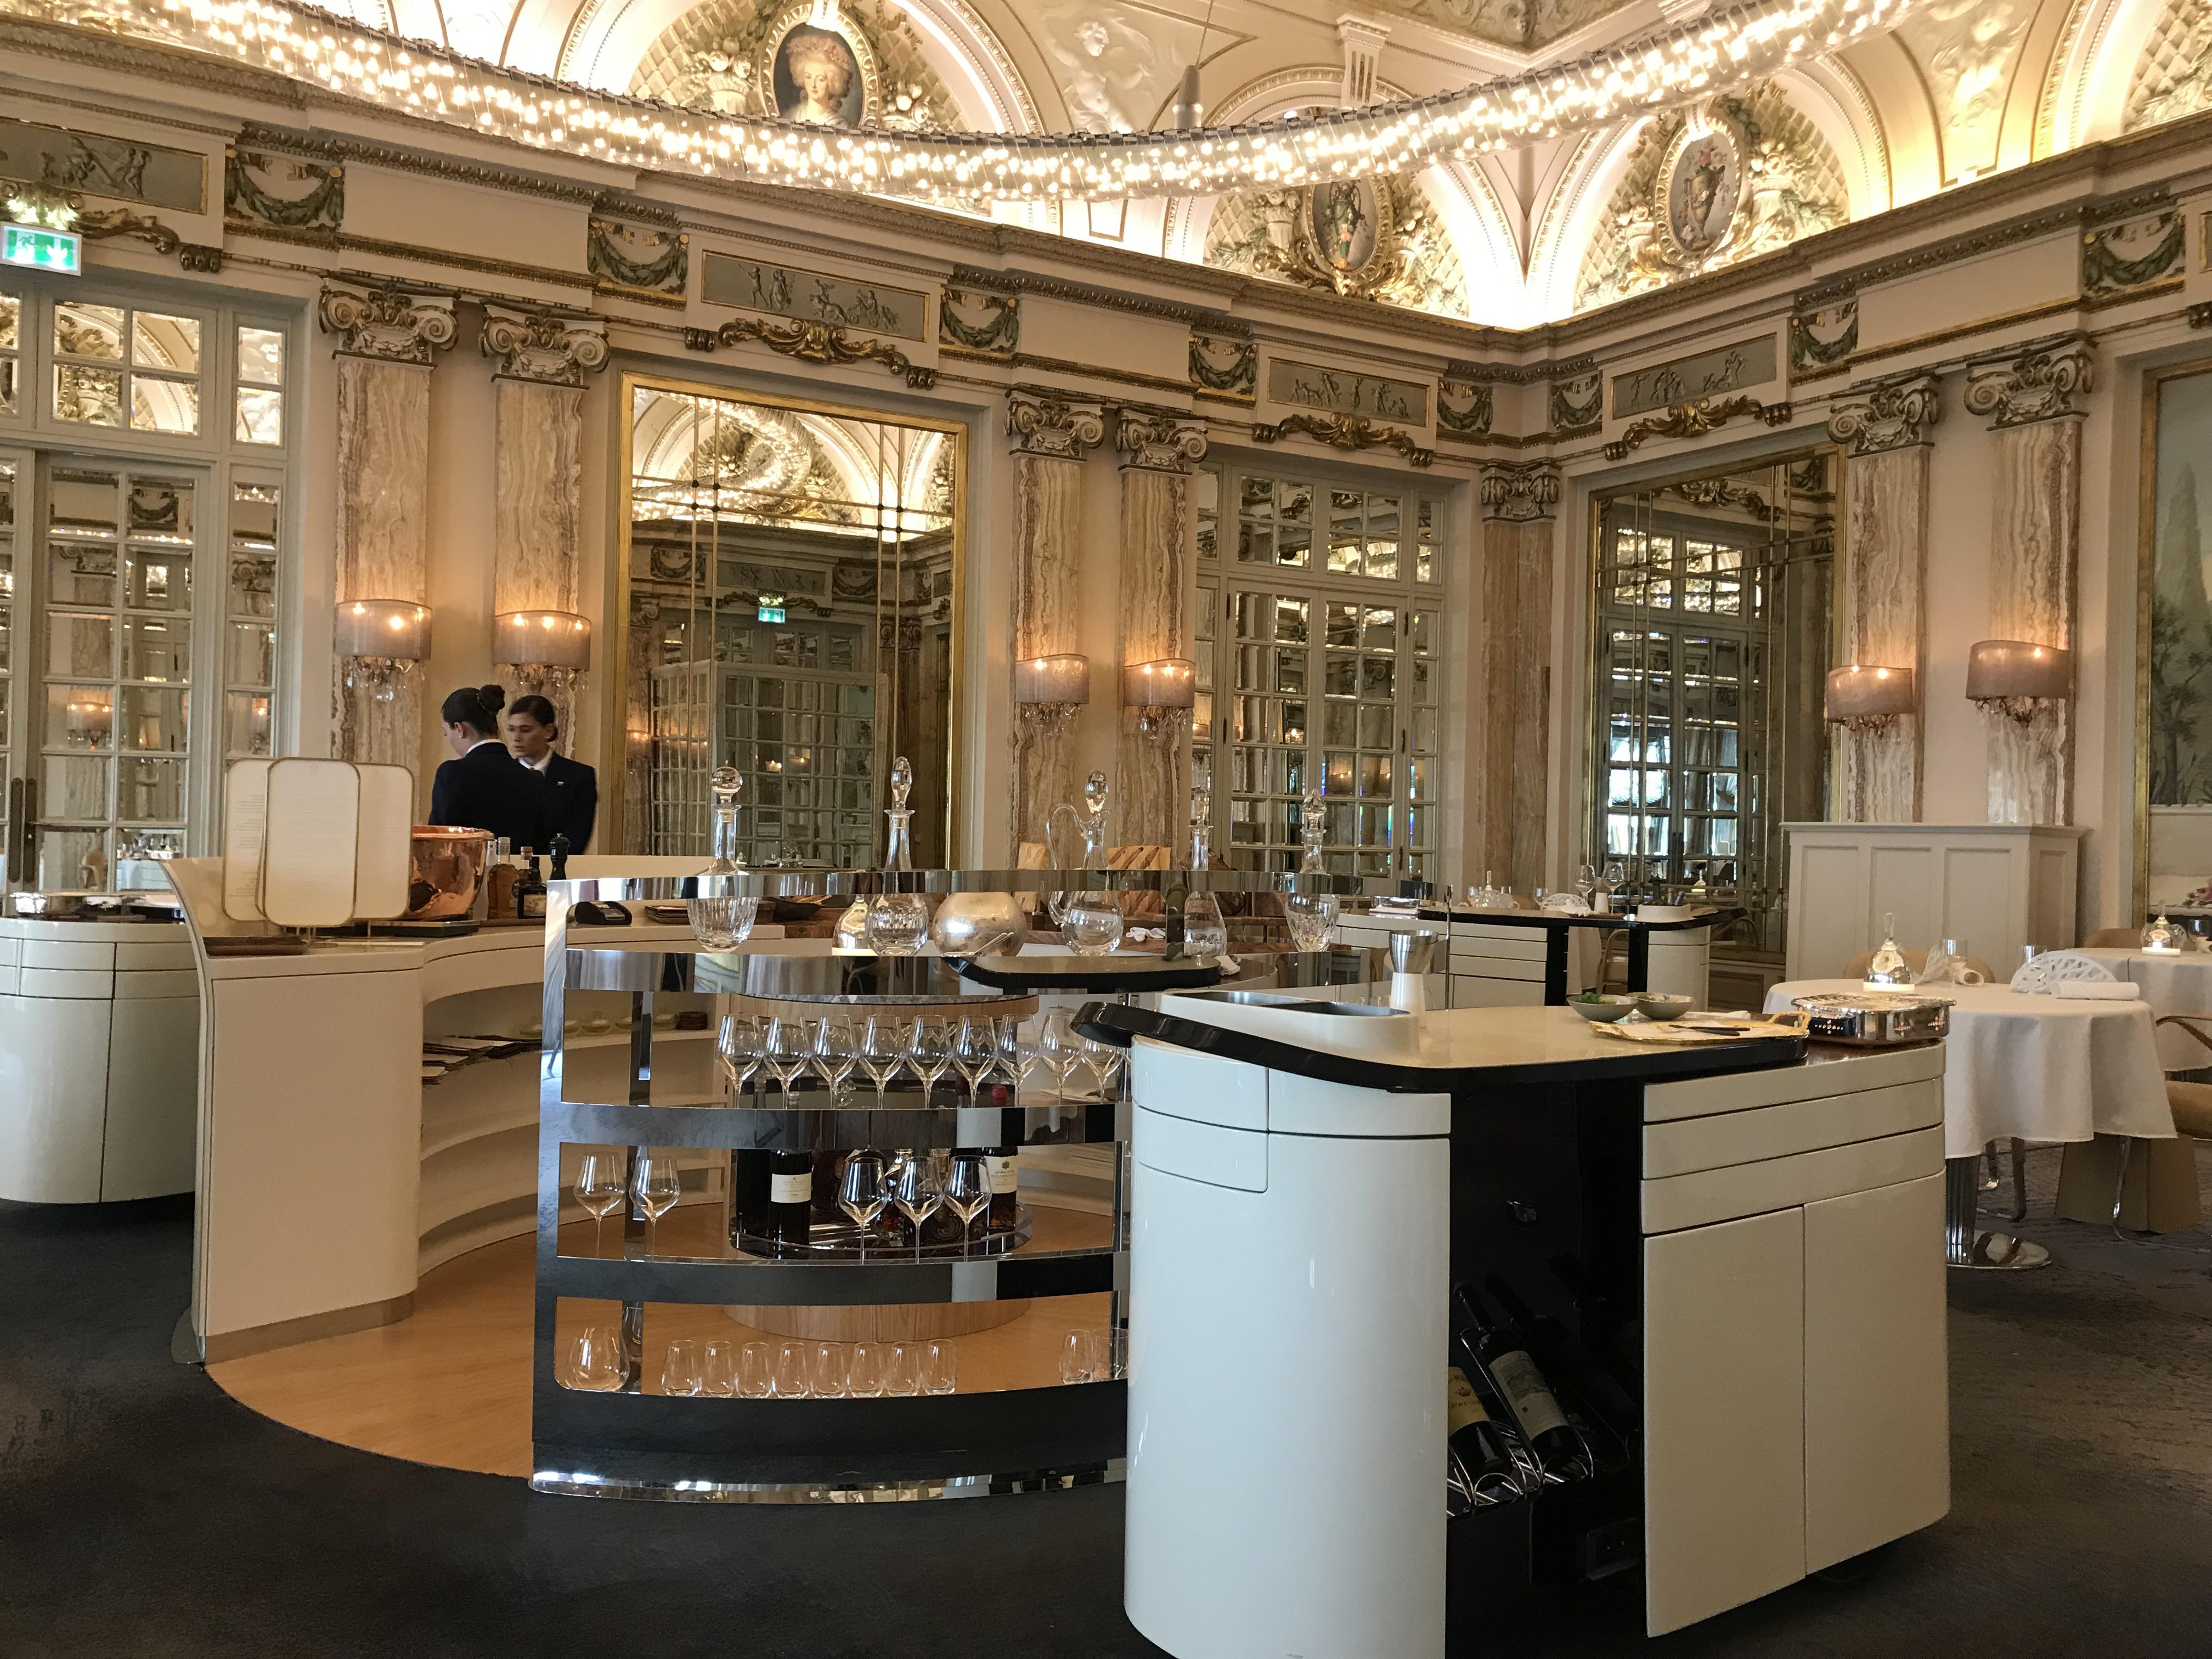 la nouvelle salle du Louis XV ©Sandrine Kauffer-Binz